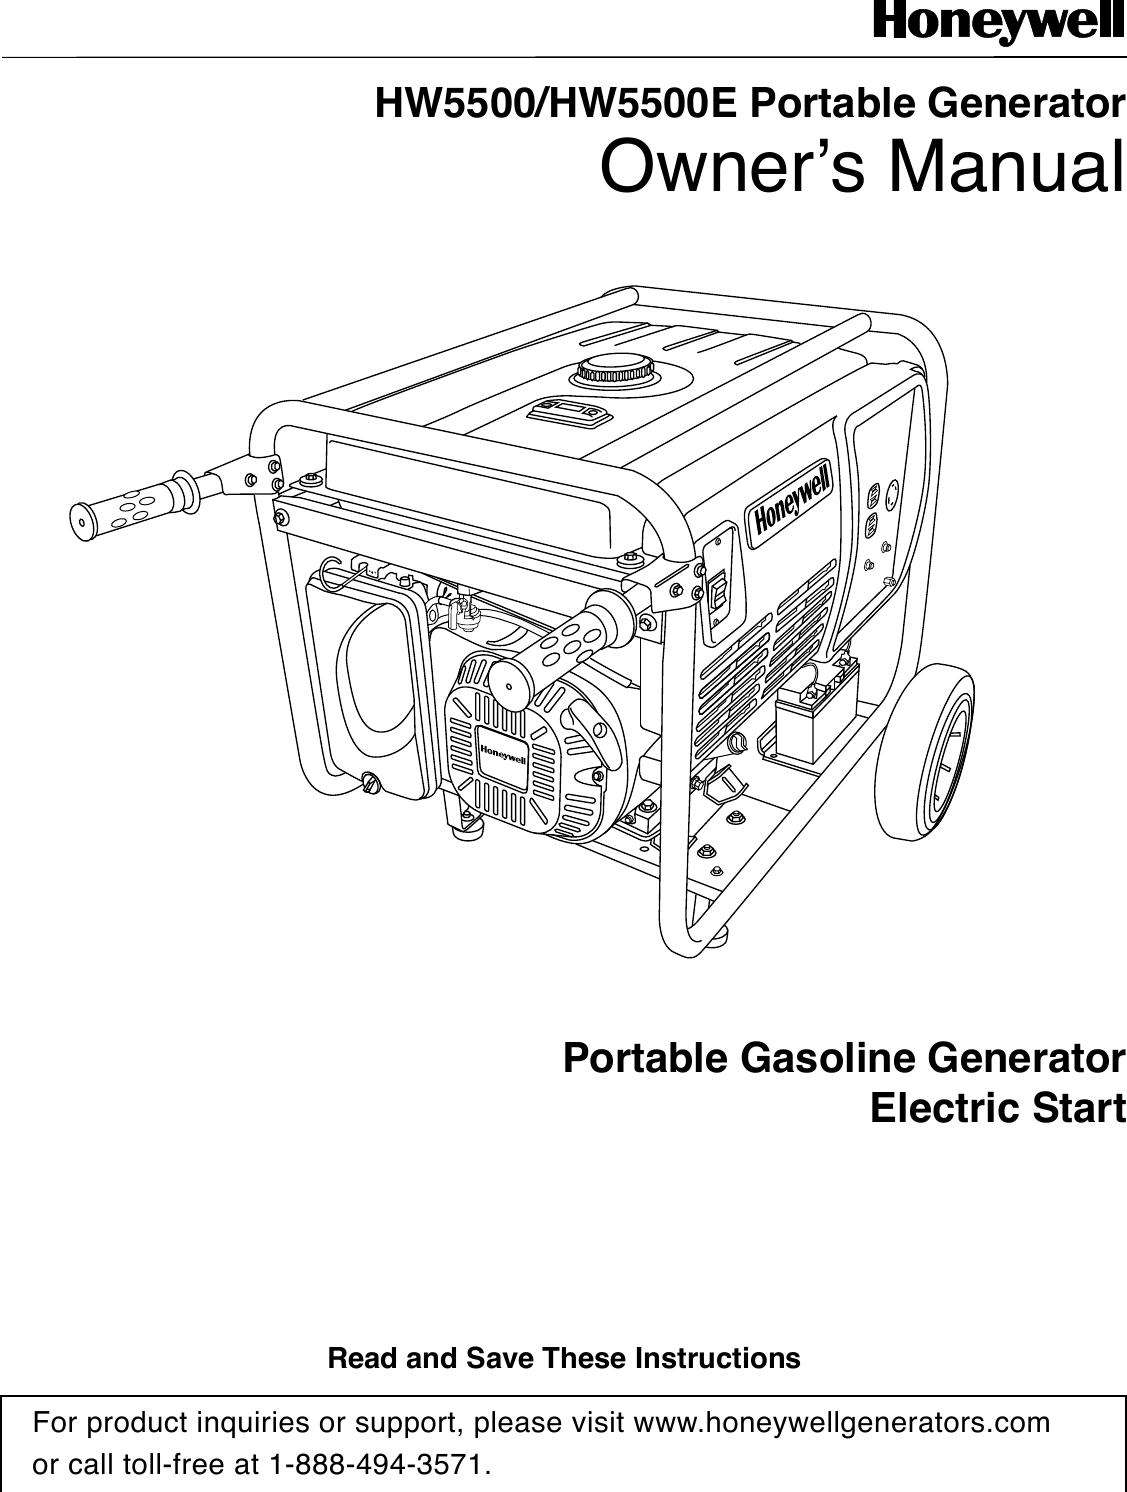 Honeywell Portable Generator Hw5500 Users Manual HW5500